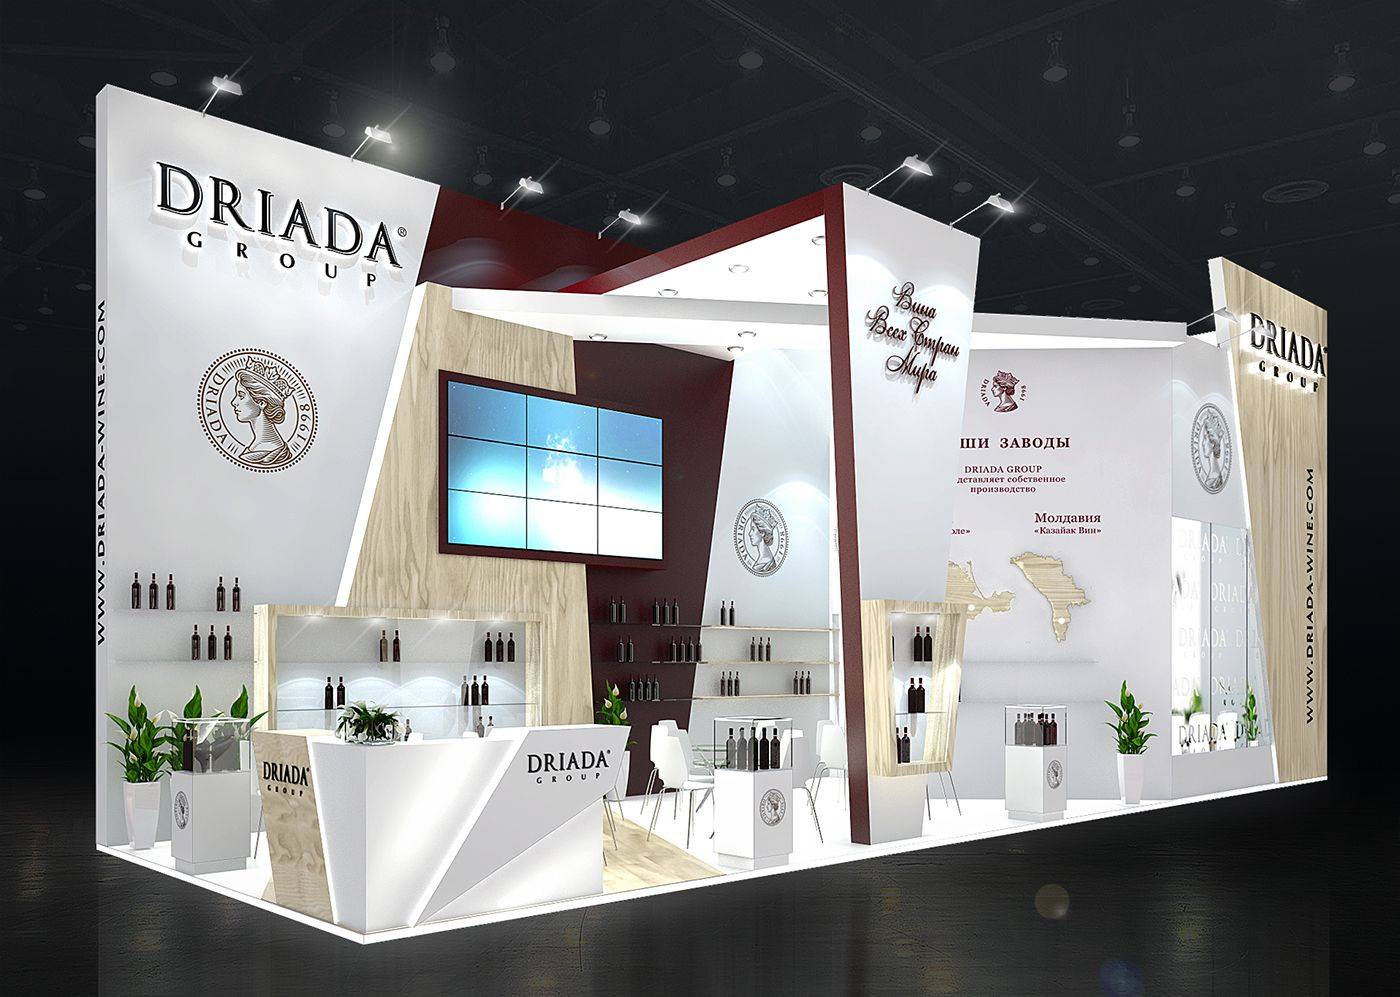 Exhibition Stand Wall : Driada group prodexpo d fuar stand tasarımlar exhibition